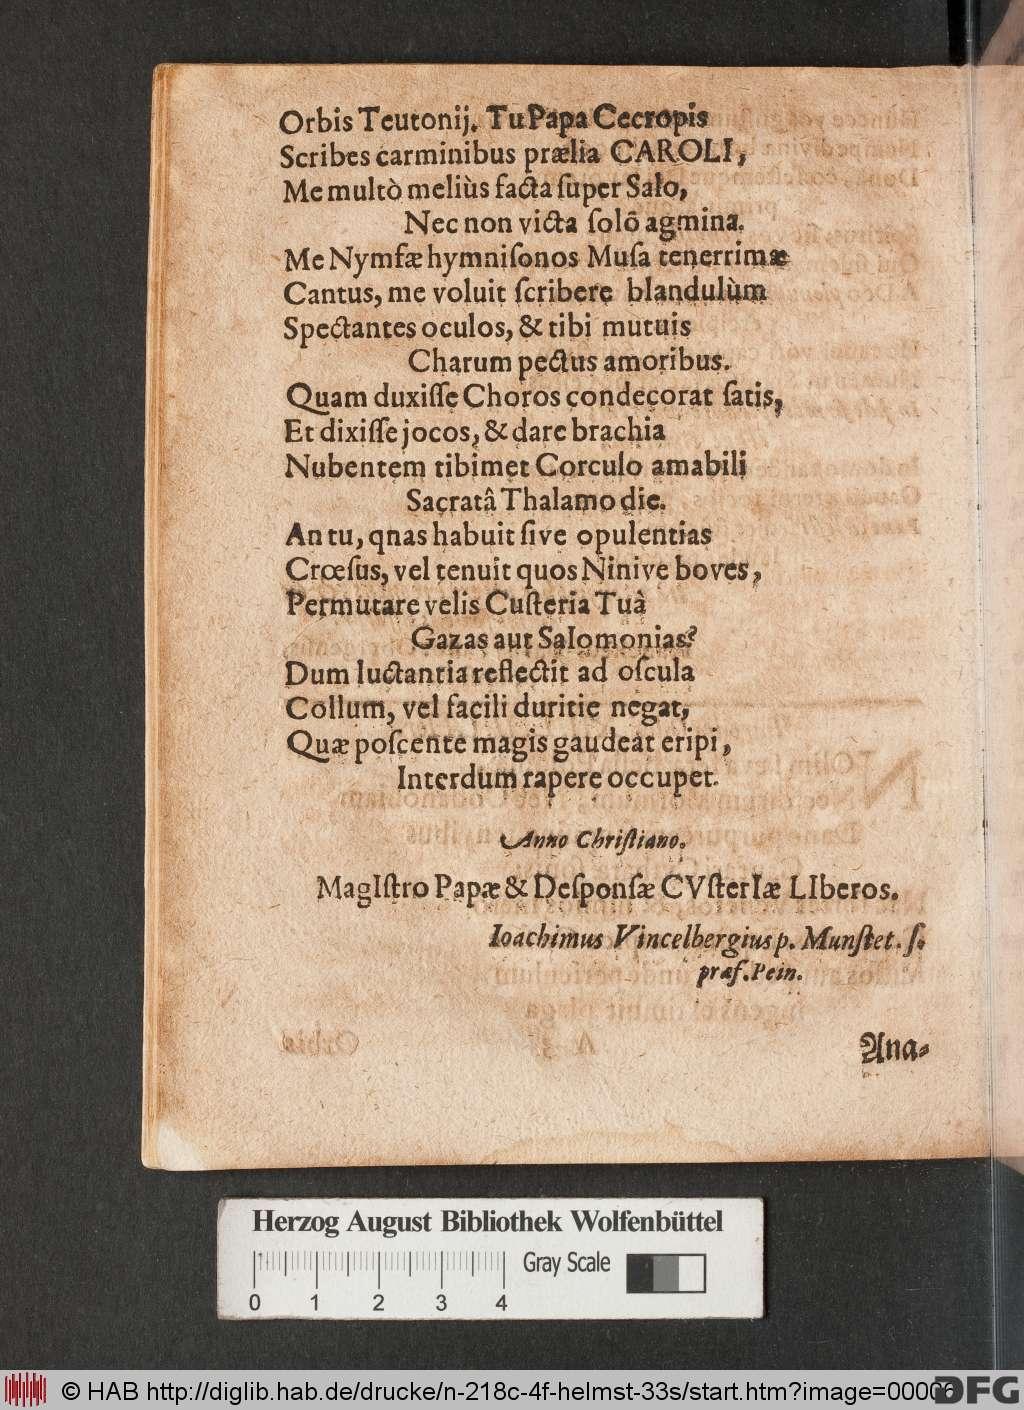 http://diglib.hab.de/drucke/n-218c-4f-helmst-33s/00006.jpg